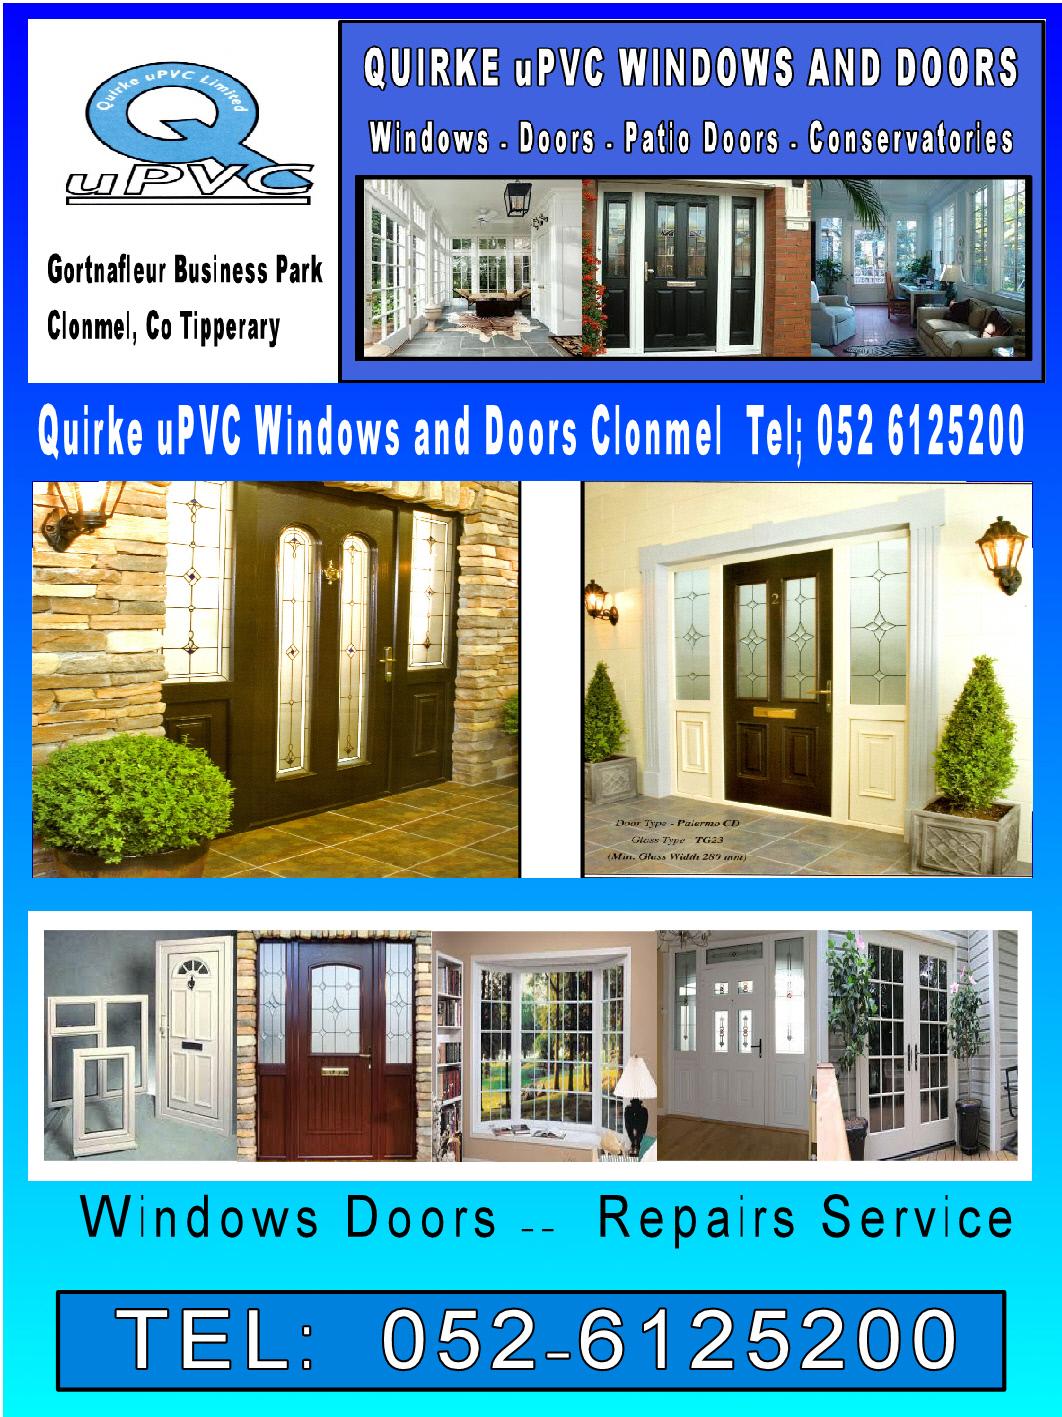 Address Gortnafleur Business Park Clonmel CoTipperary Contact 052 6125200